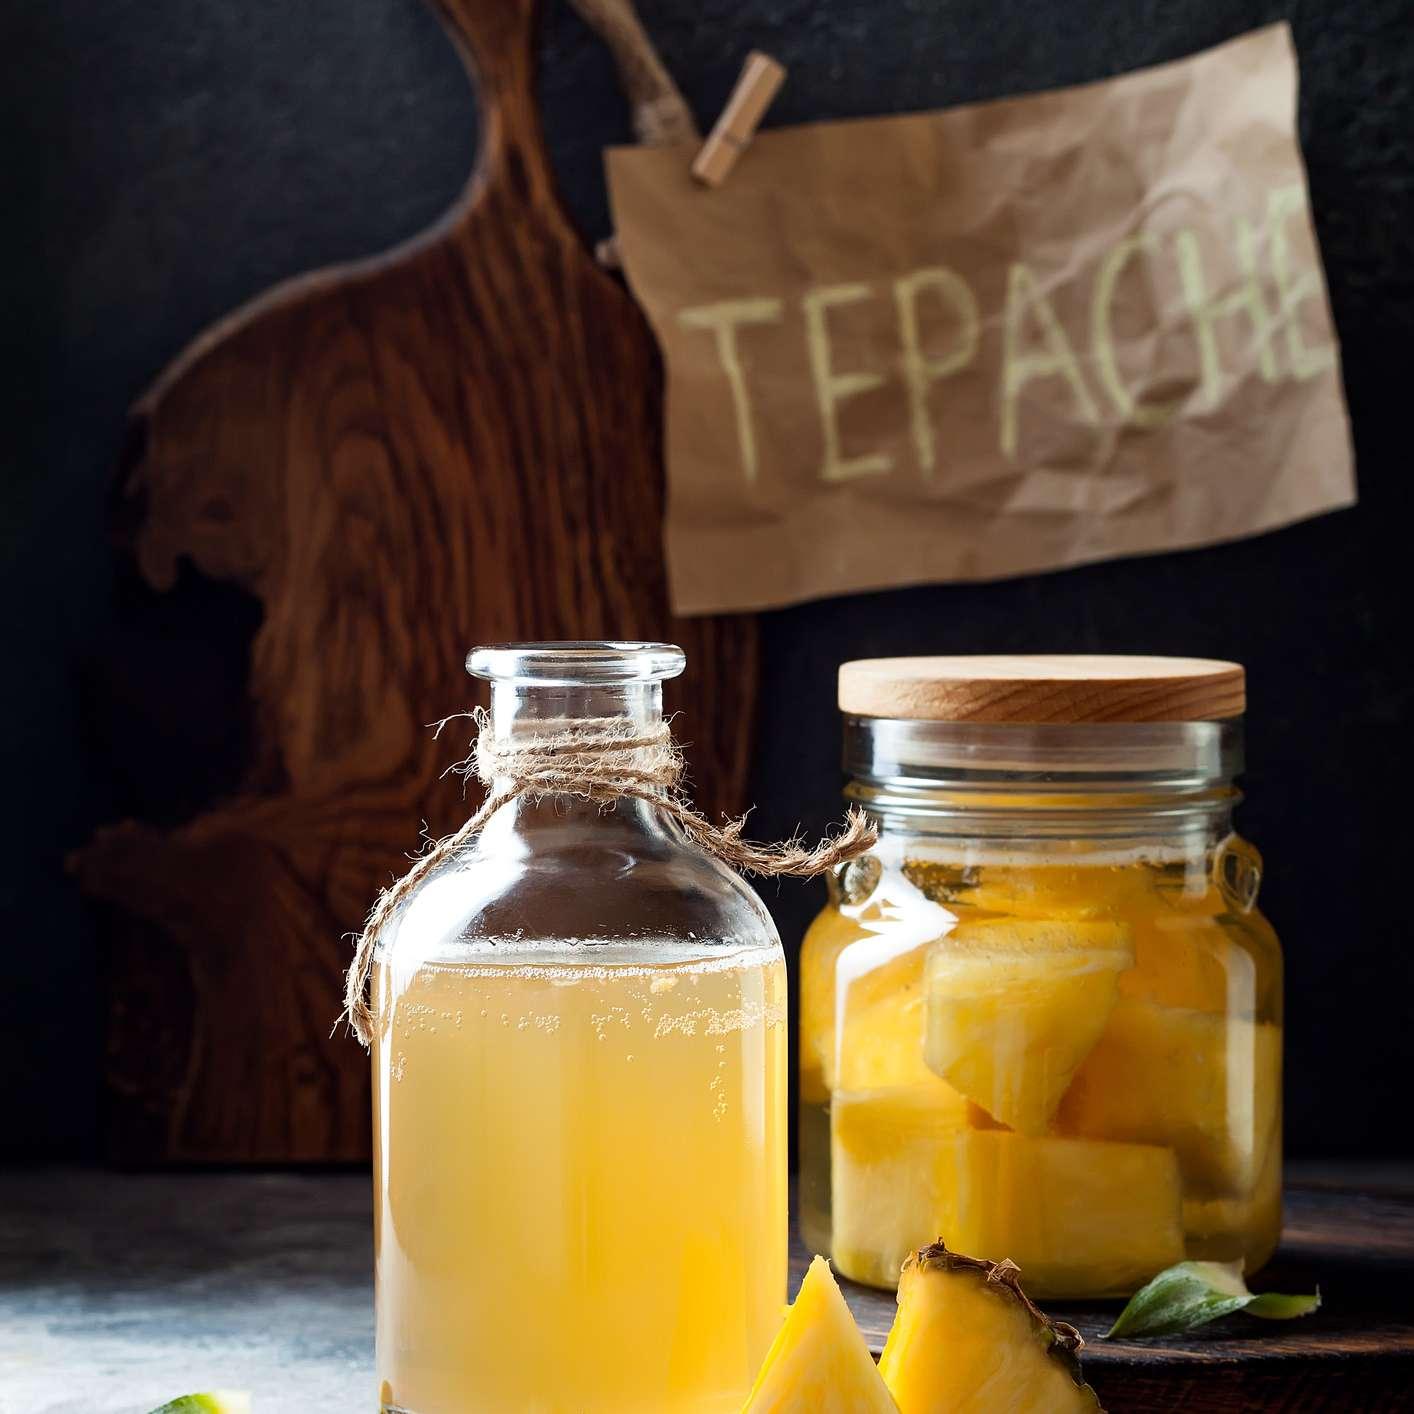 A display of jarred pineapple tepache